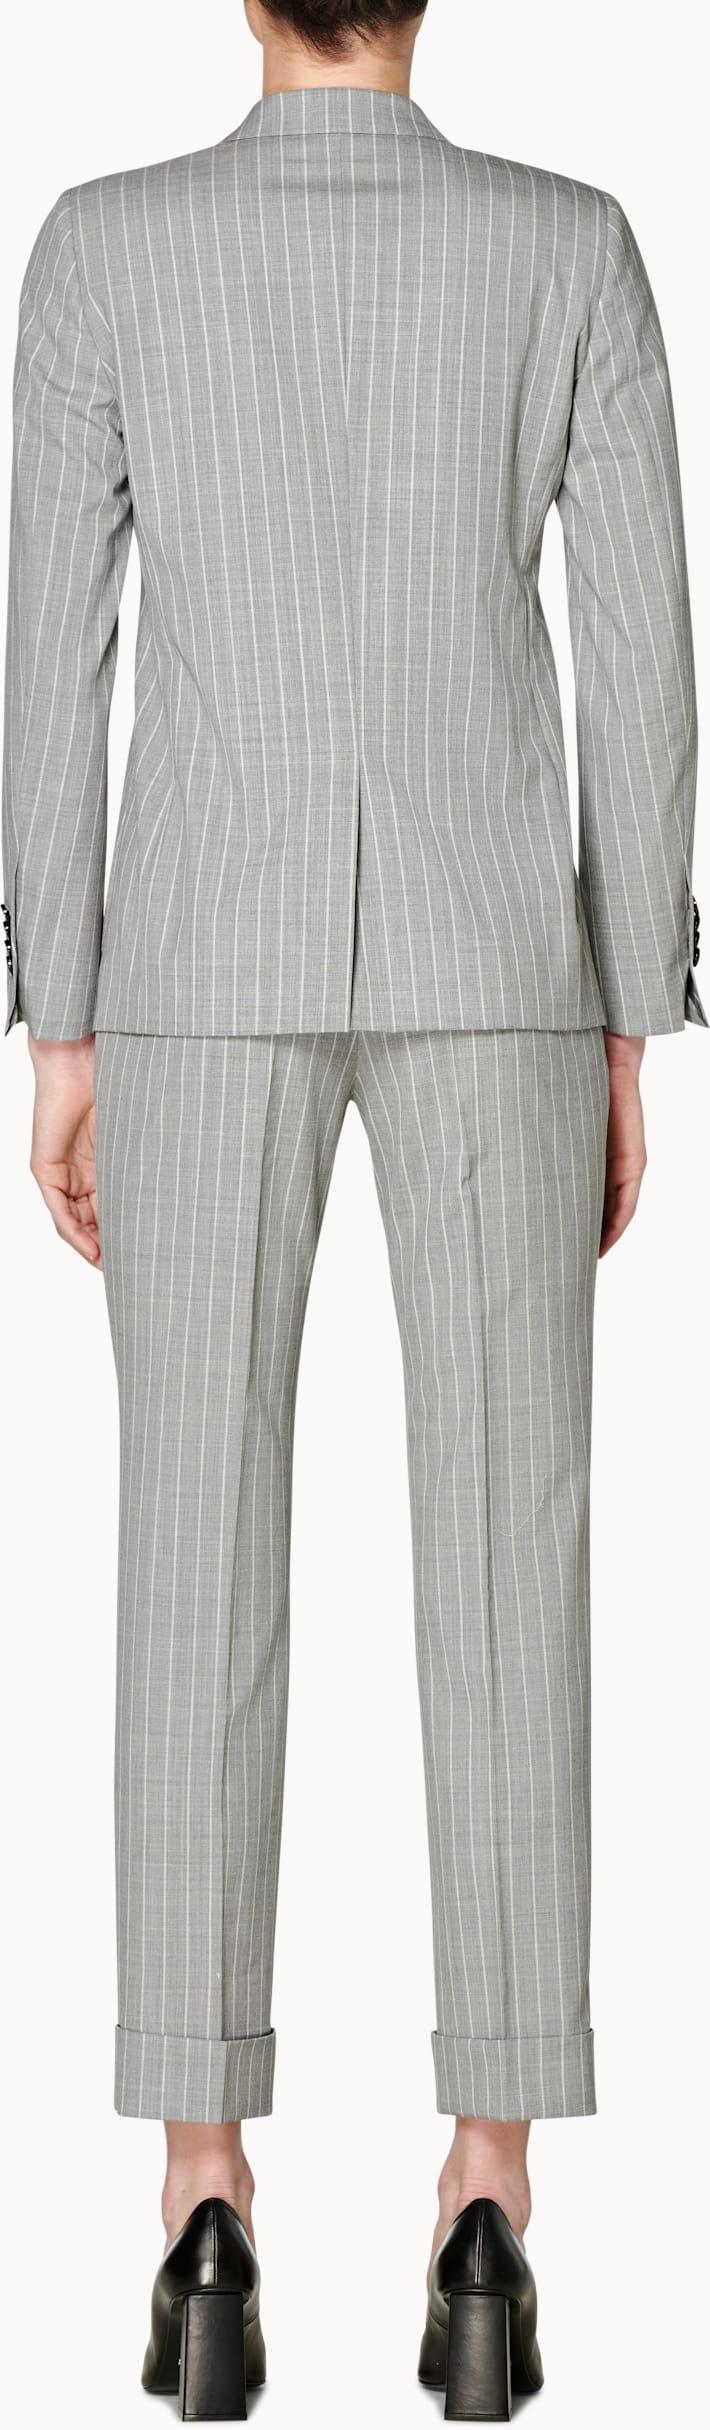 Joss Light Grey Striped Suit